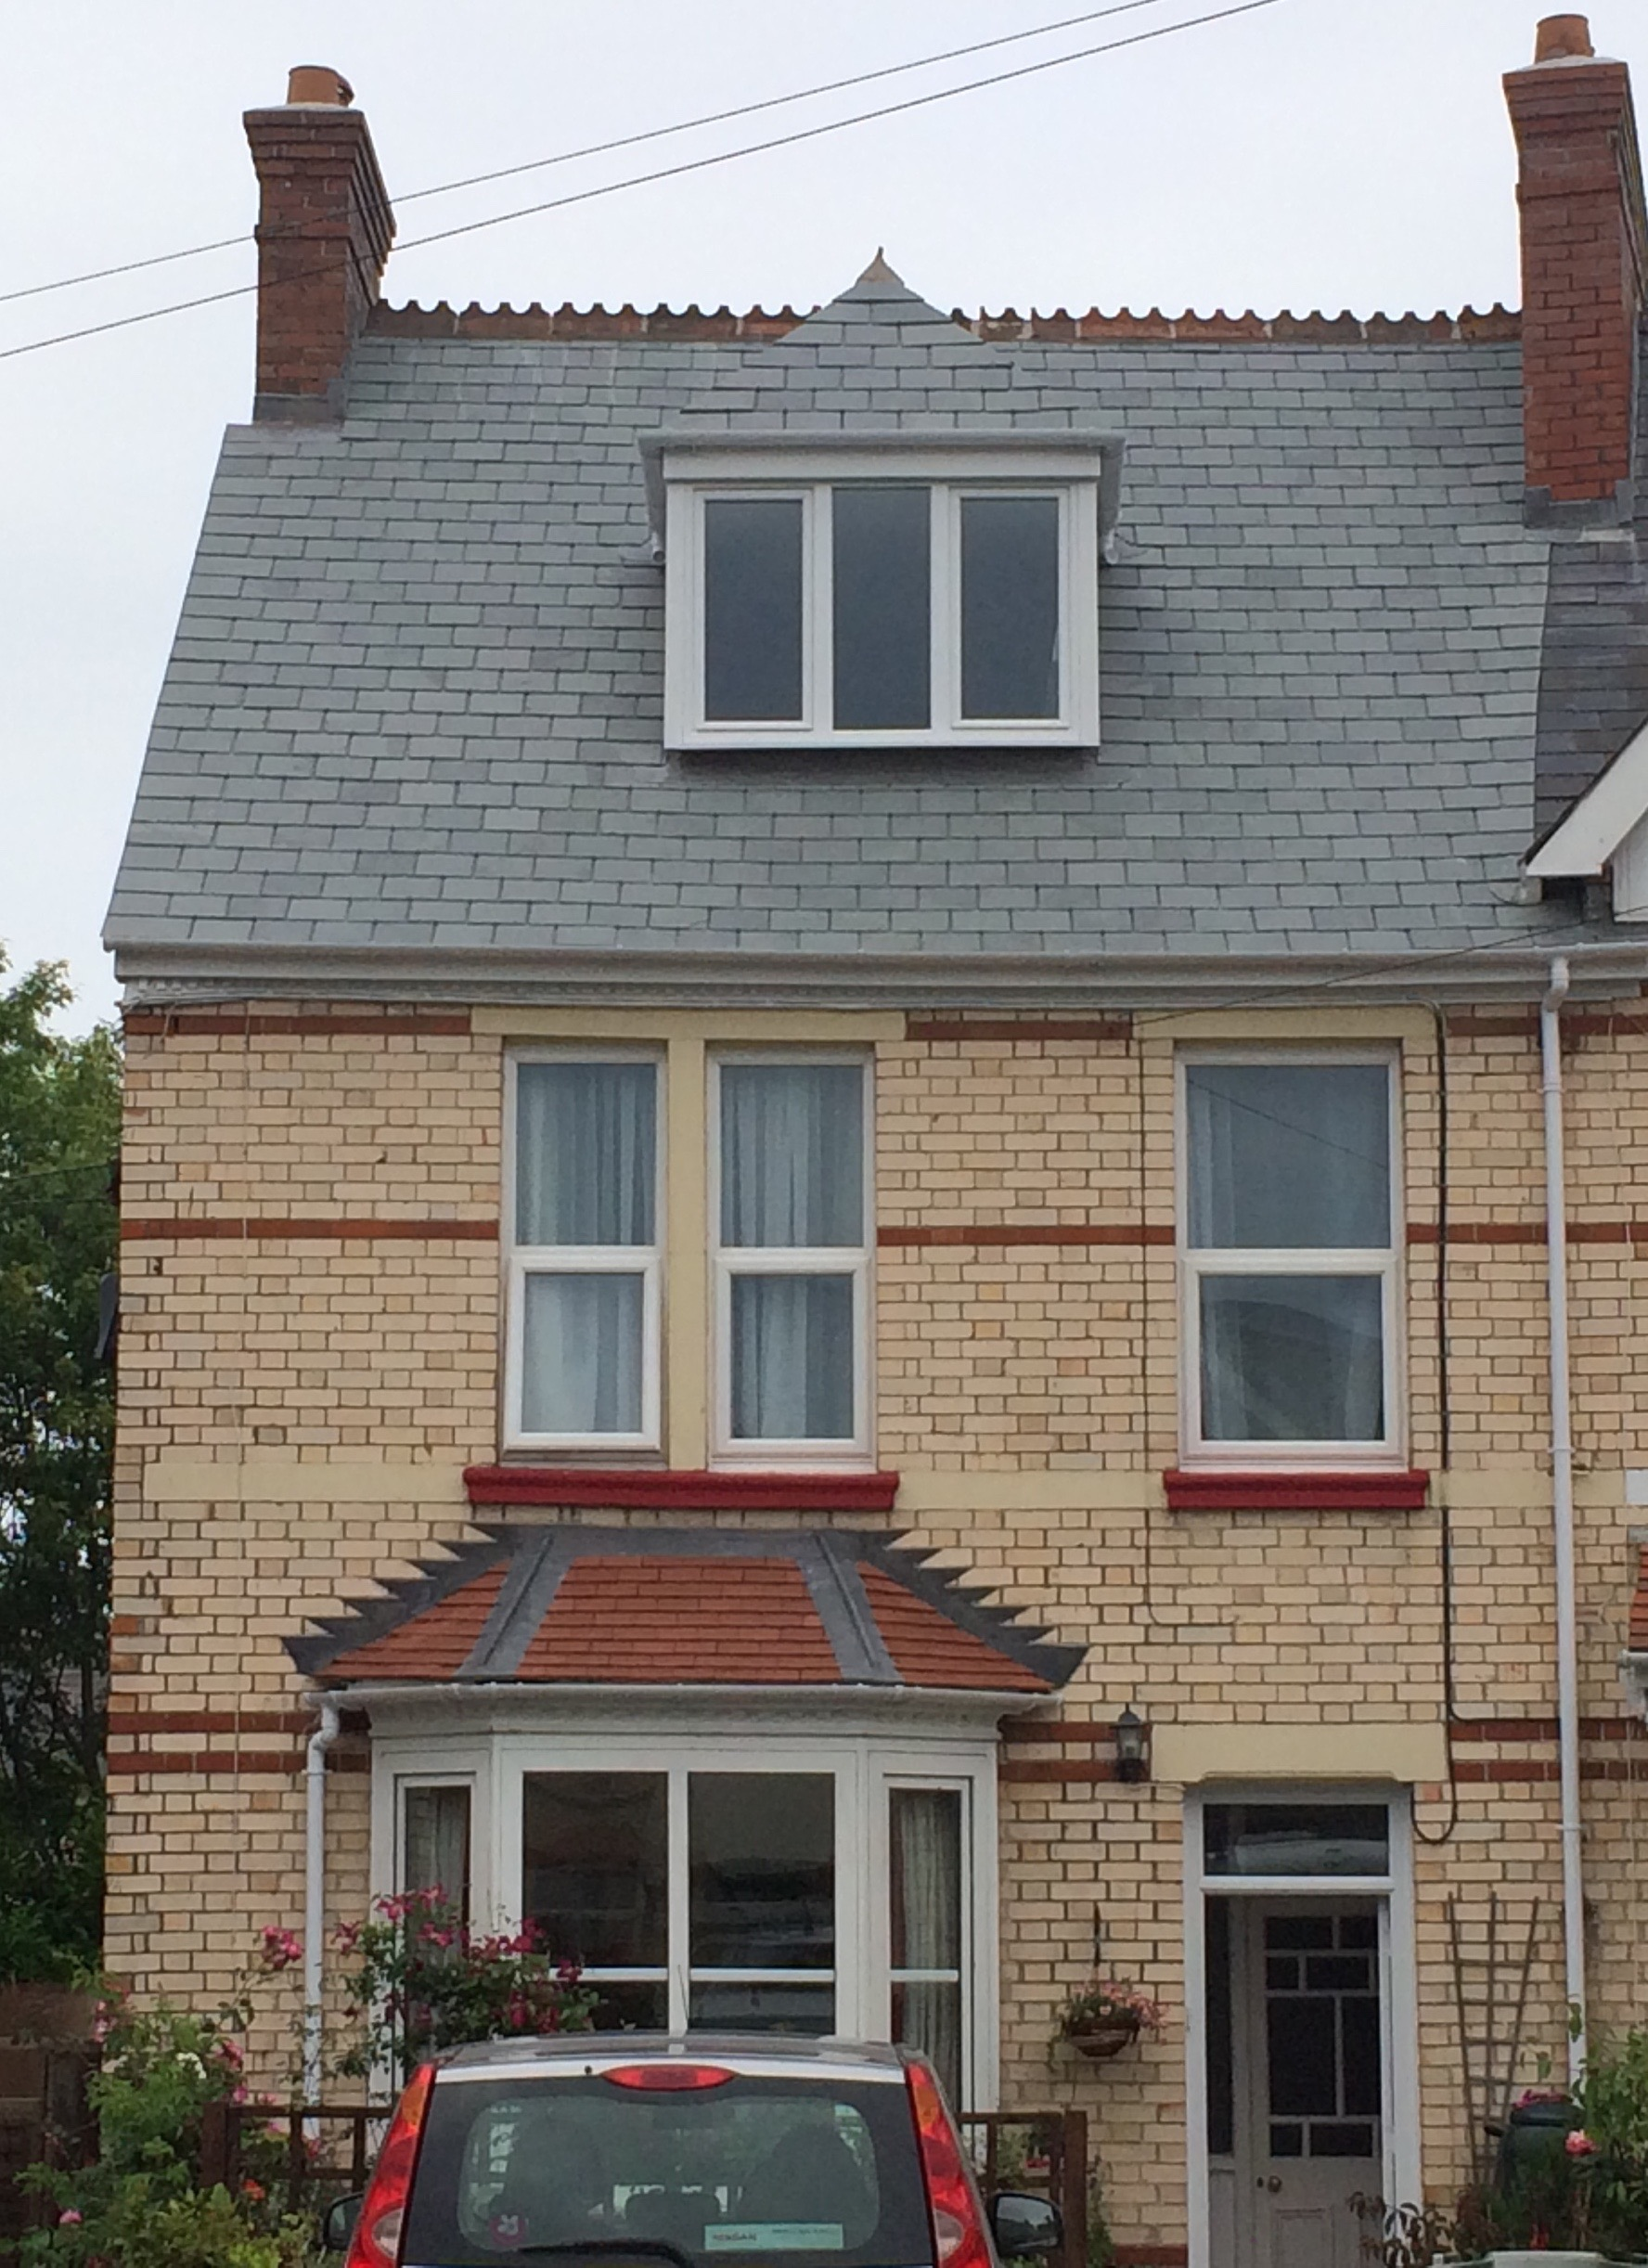 Slate Roofing Amp Leadwork Services In North Devon Jamie